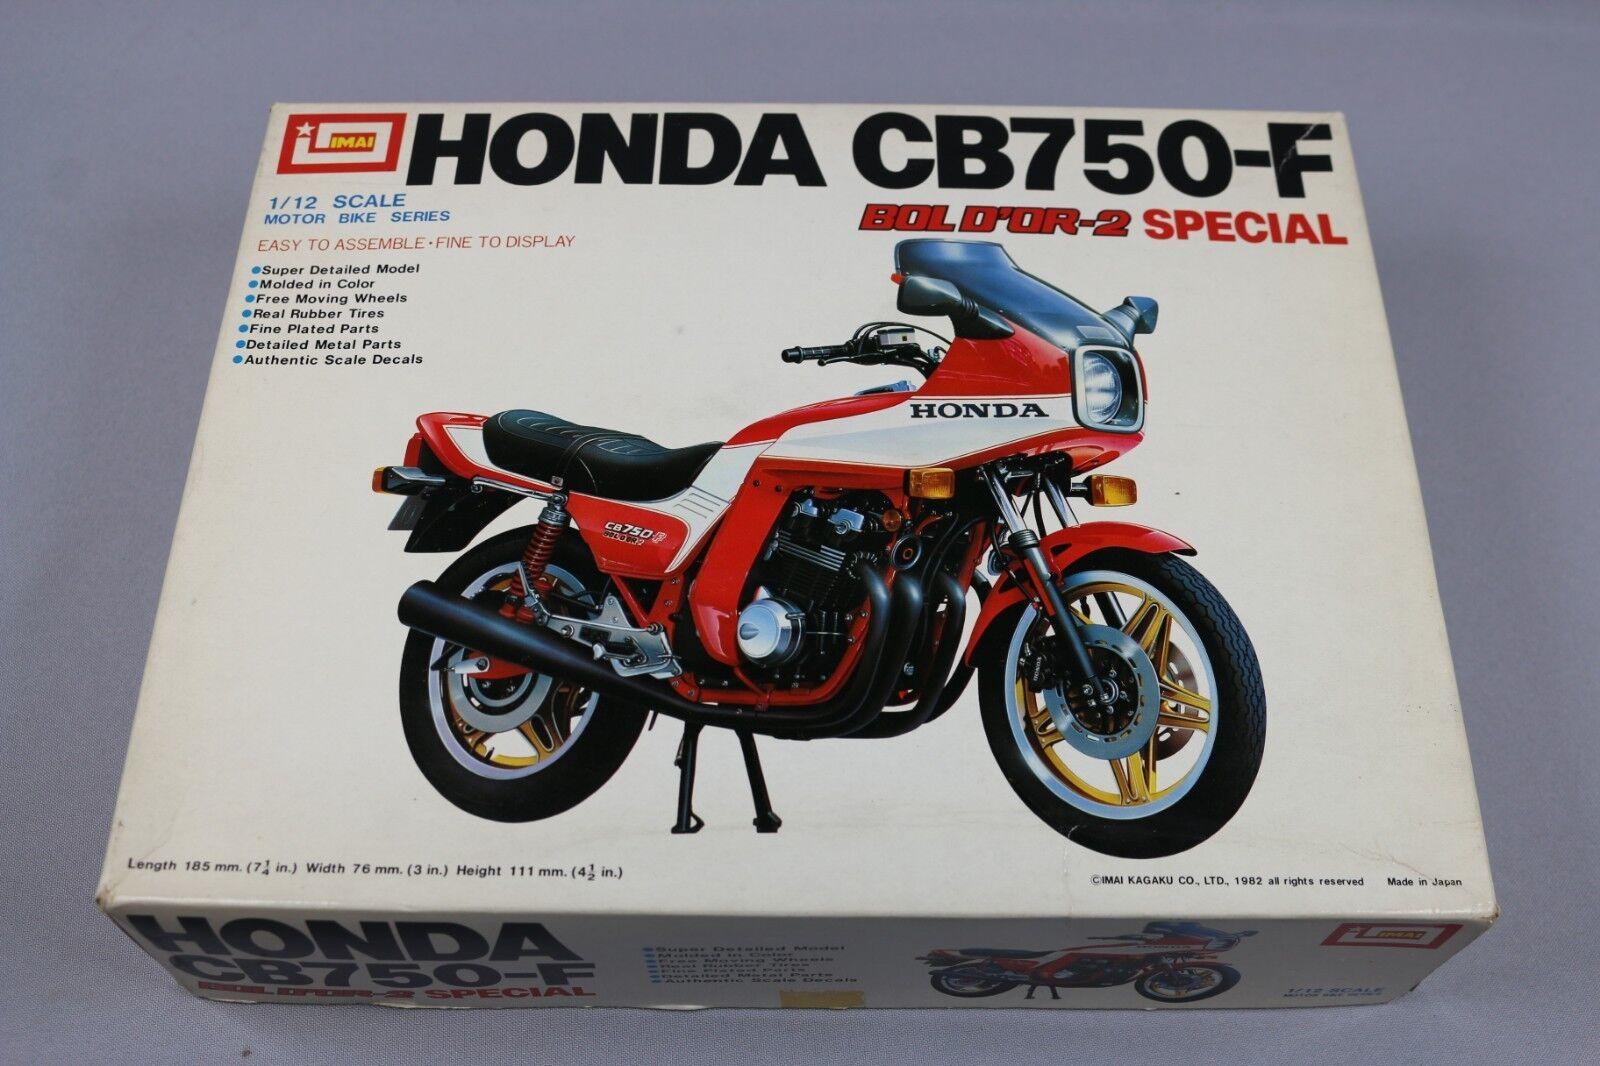 ZF1035 Imai 1 12 maquette B-1103 Honda CB750-F Bol d'Or-2 Special Motorbike